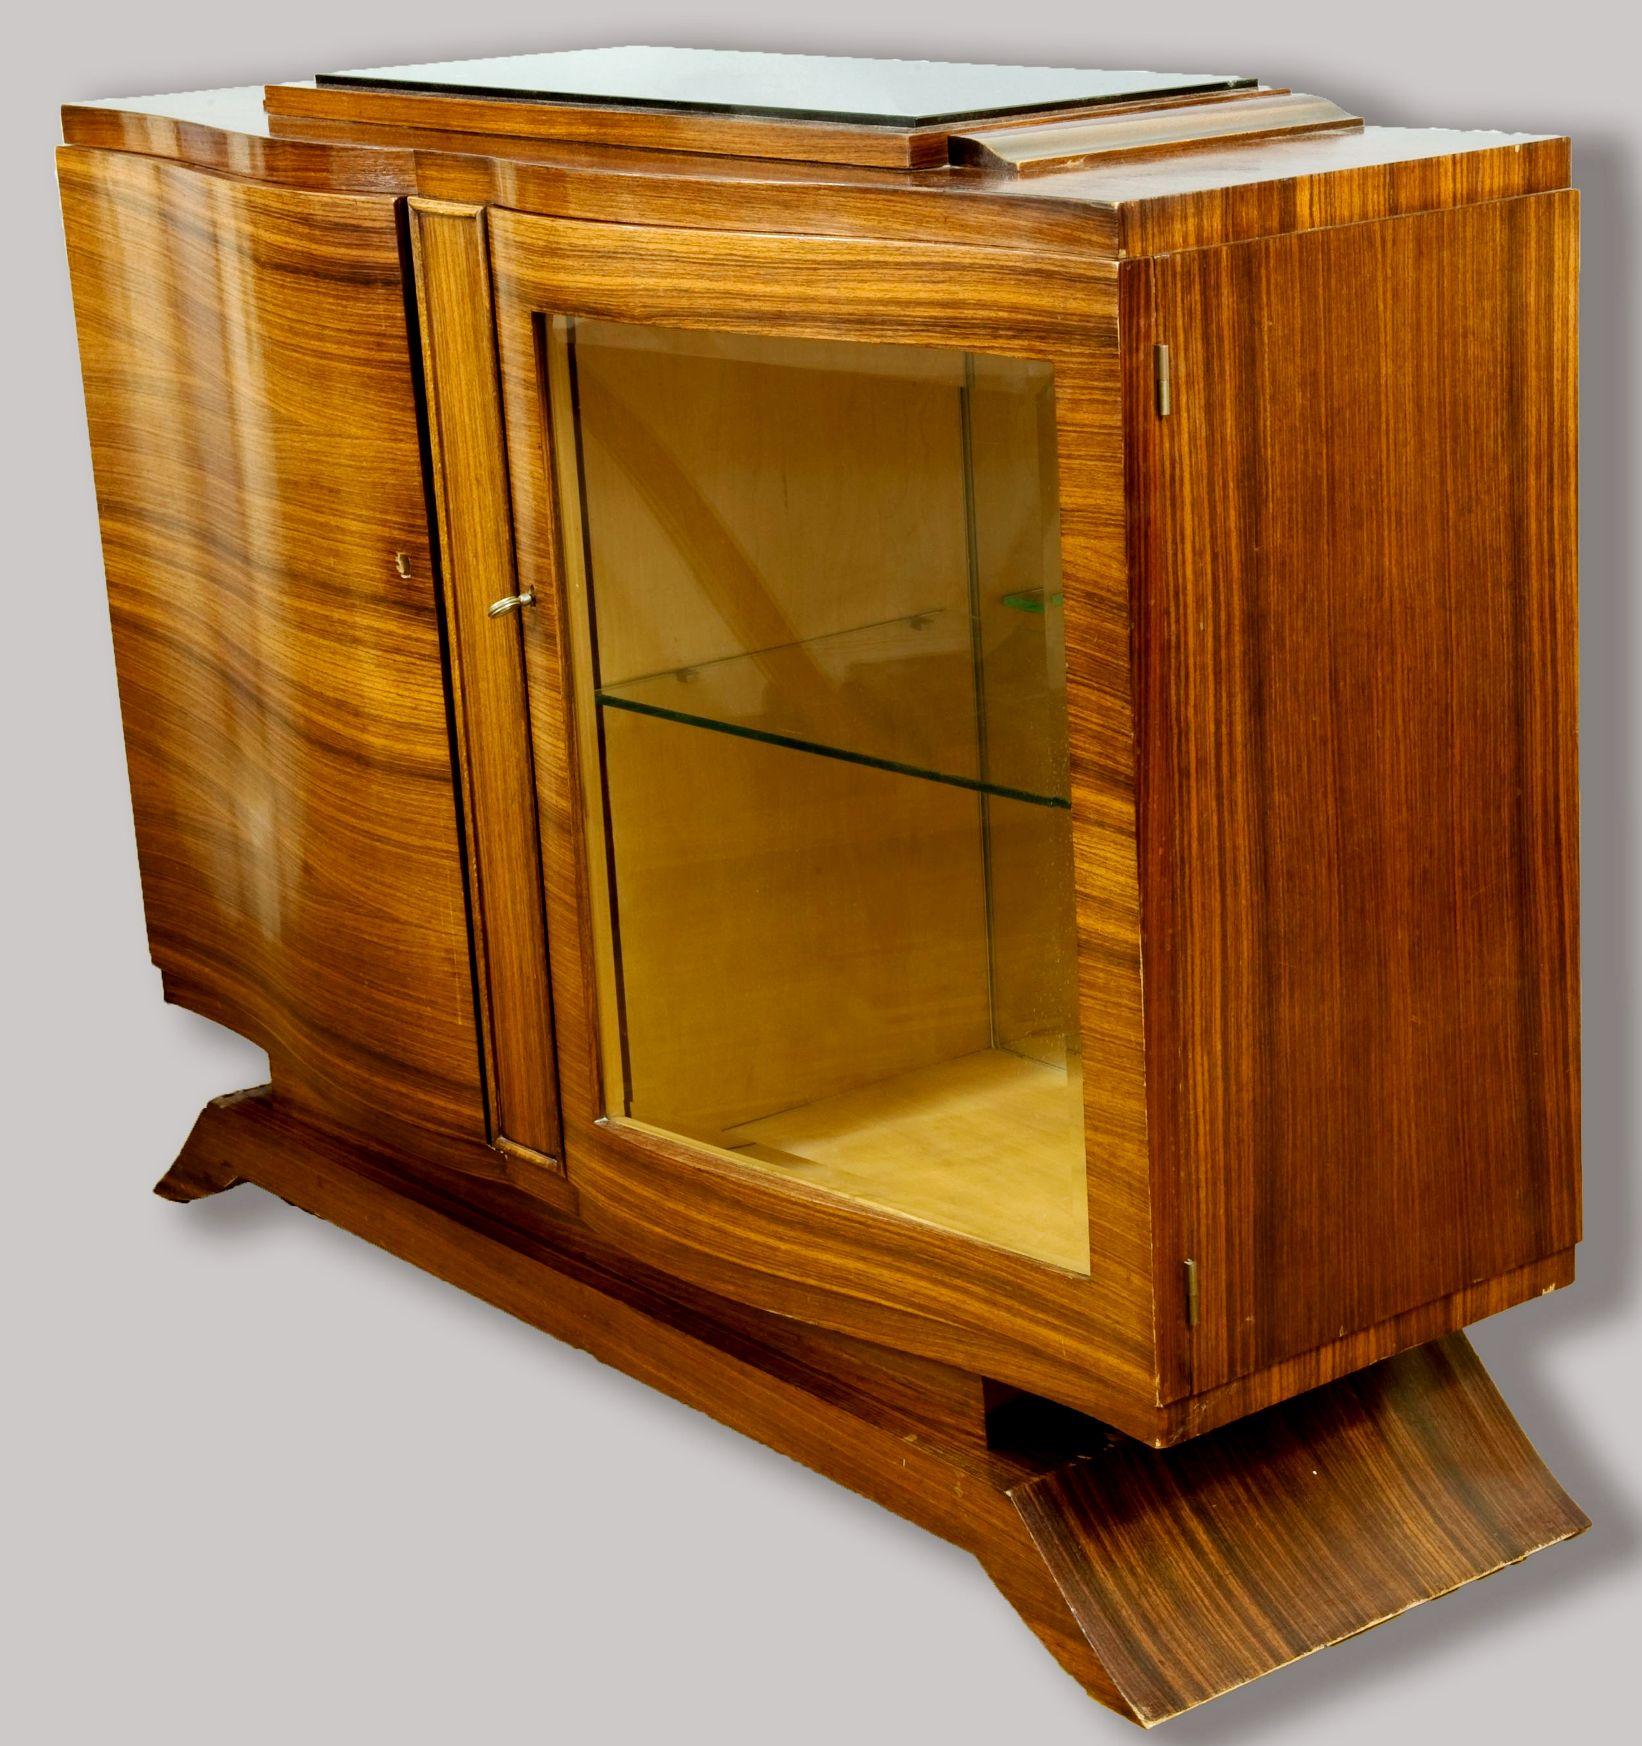 art d co bois le bouvet. Black Bedroom Furniture Sets. Home Design Ideas